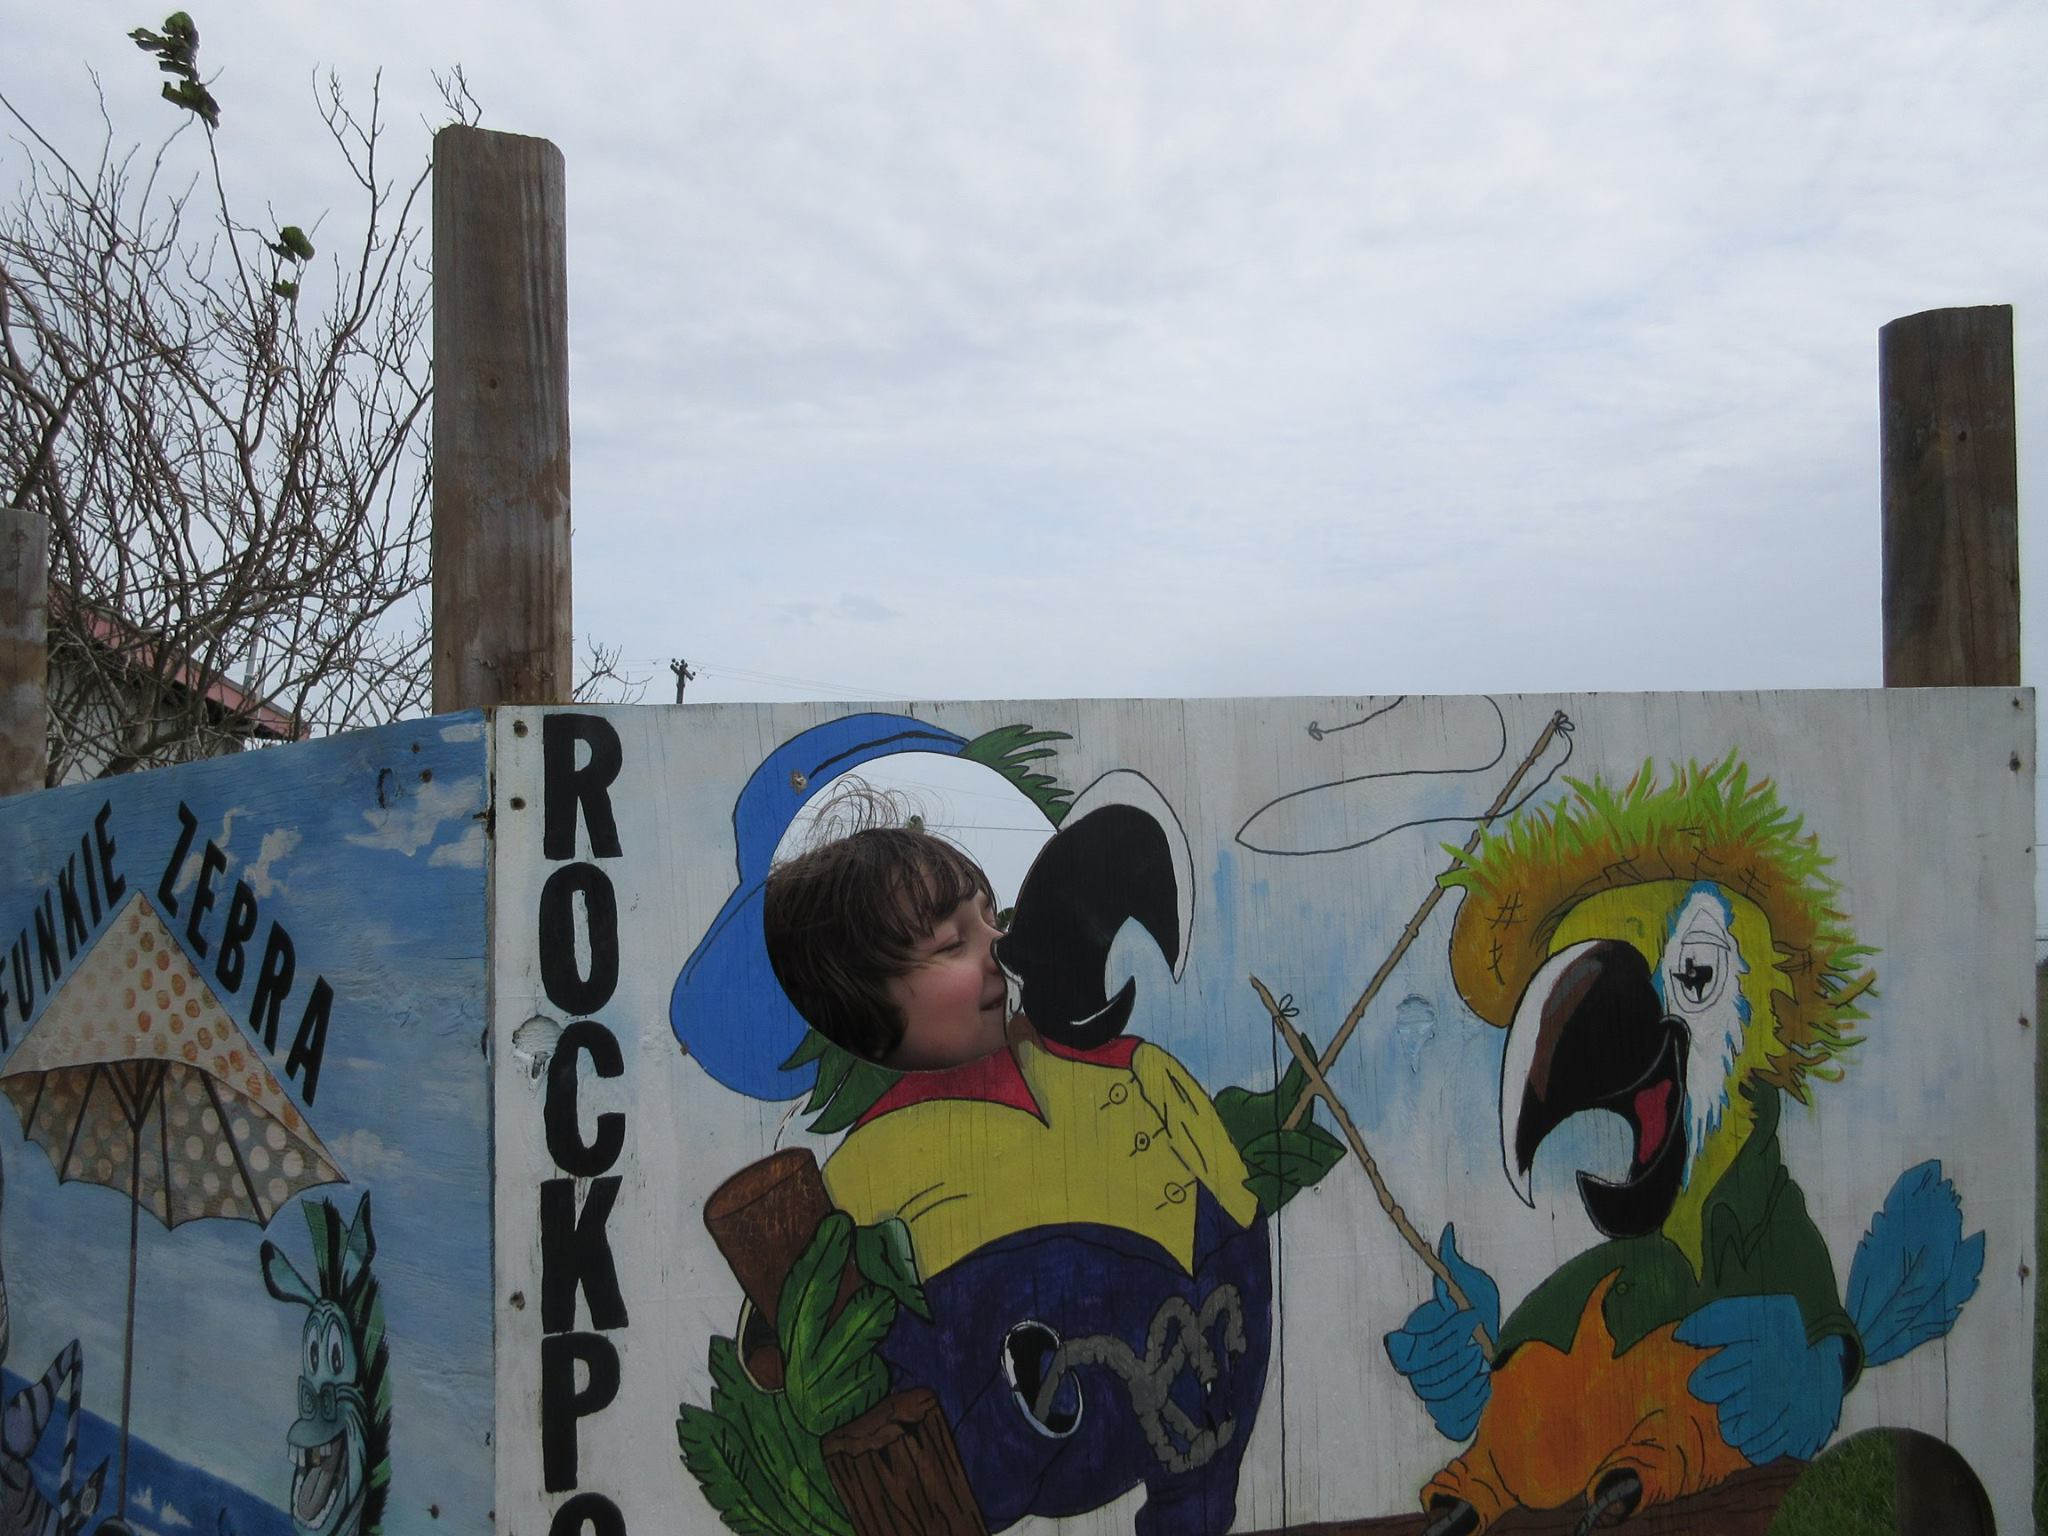 parrotnoseRockport